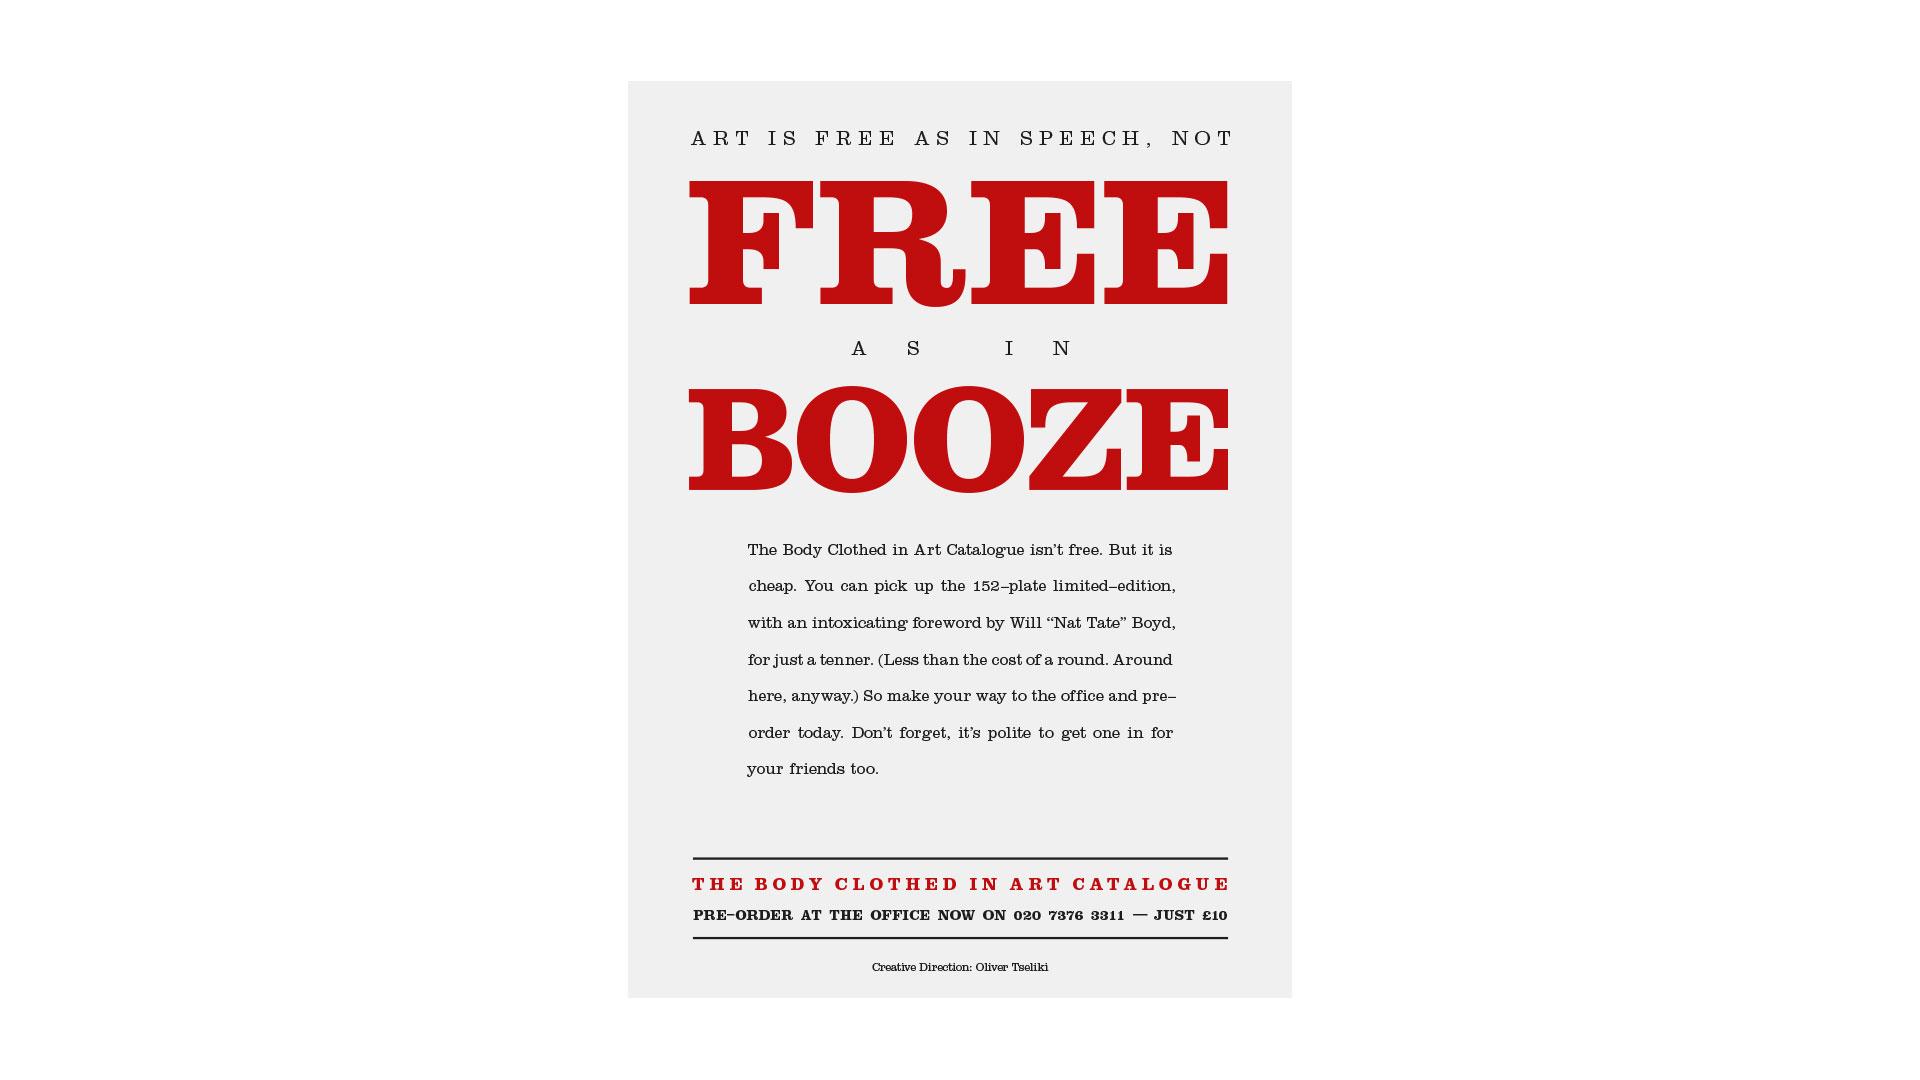 CAC_freebooze